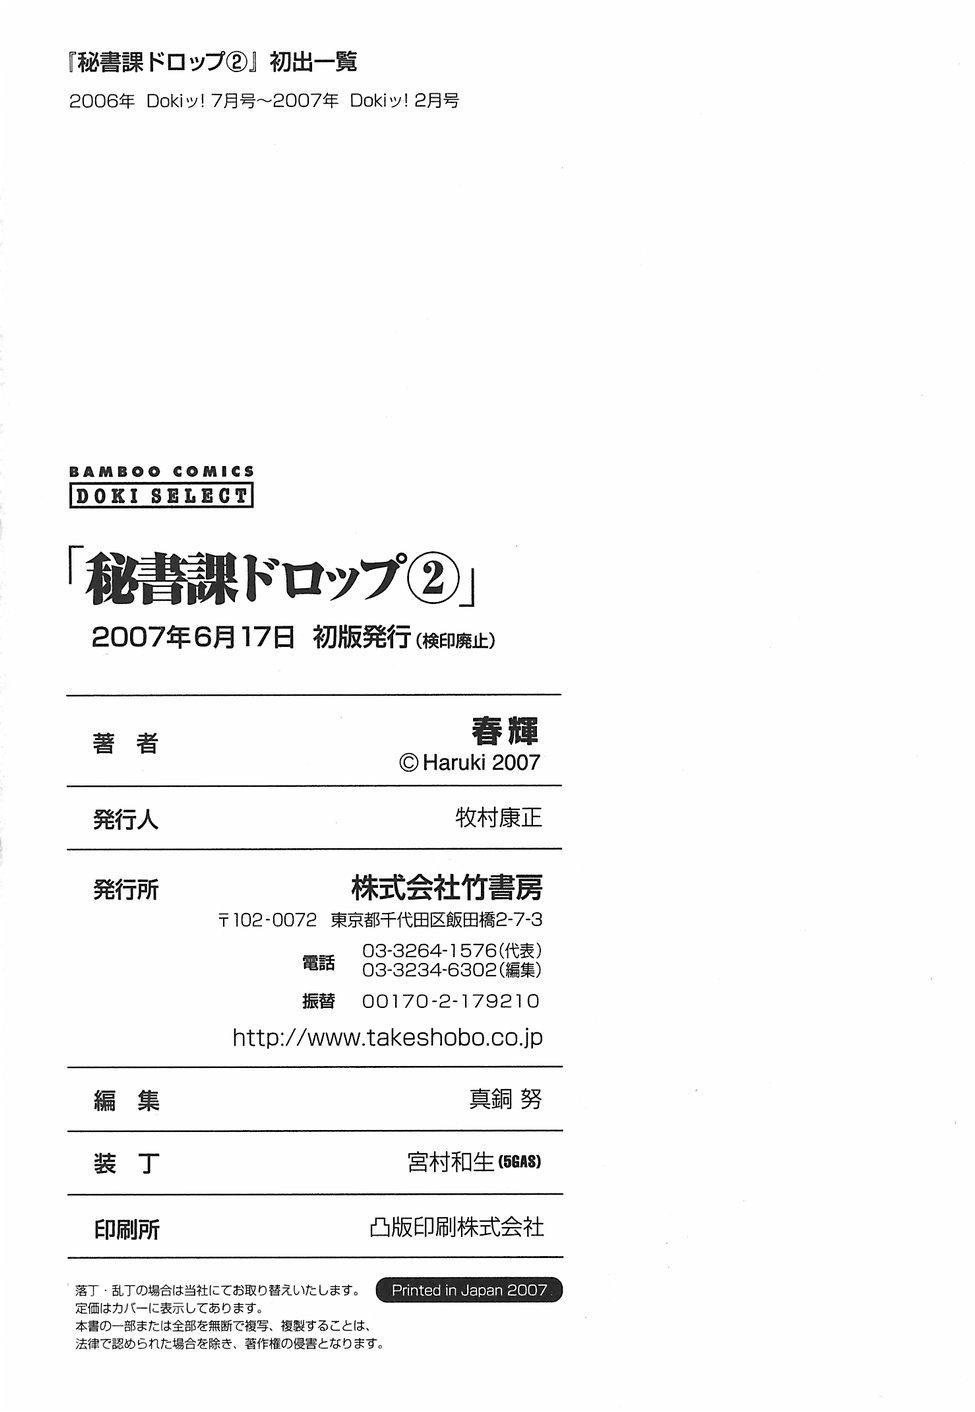 Hishoka Drop - Secretarial section Drop 2 213